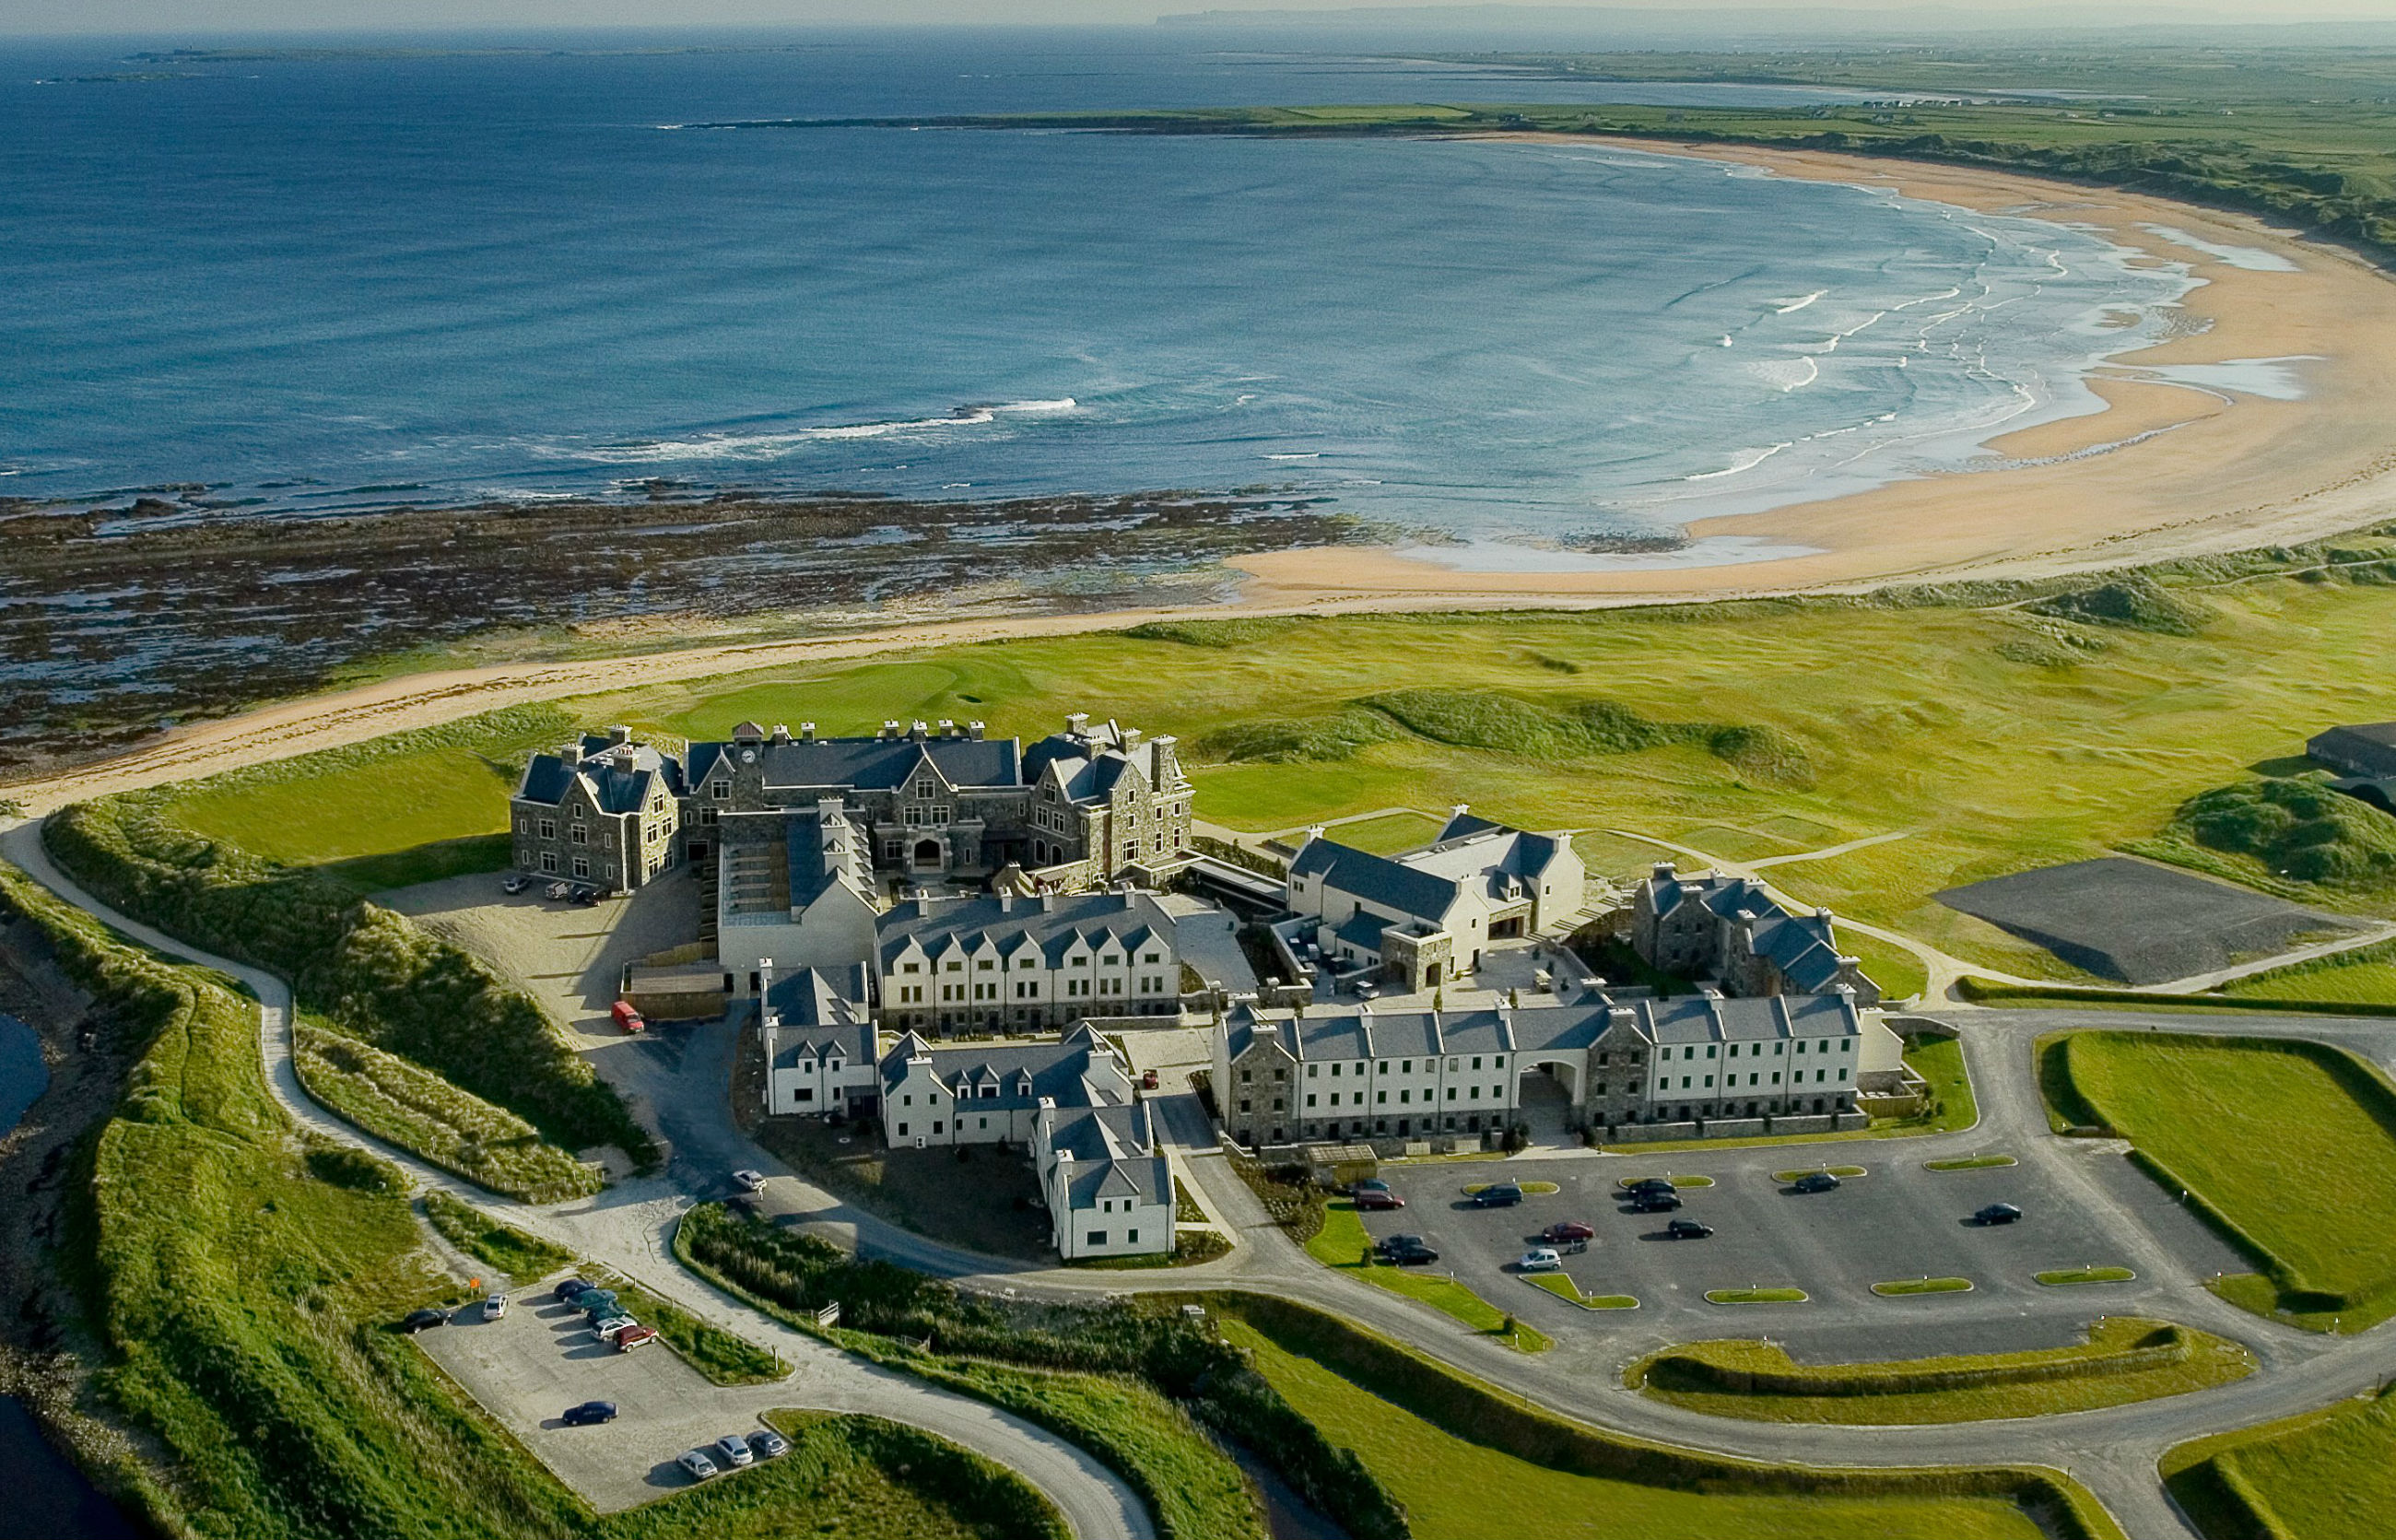 Trump Hotel Golf Course